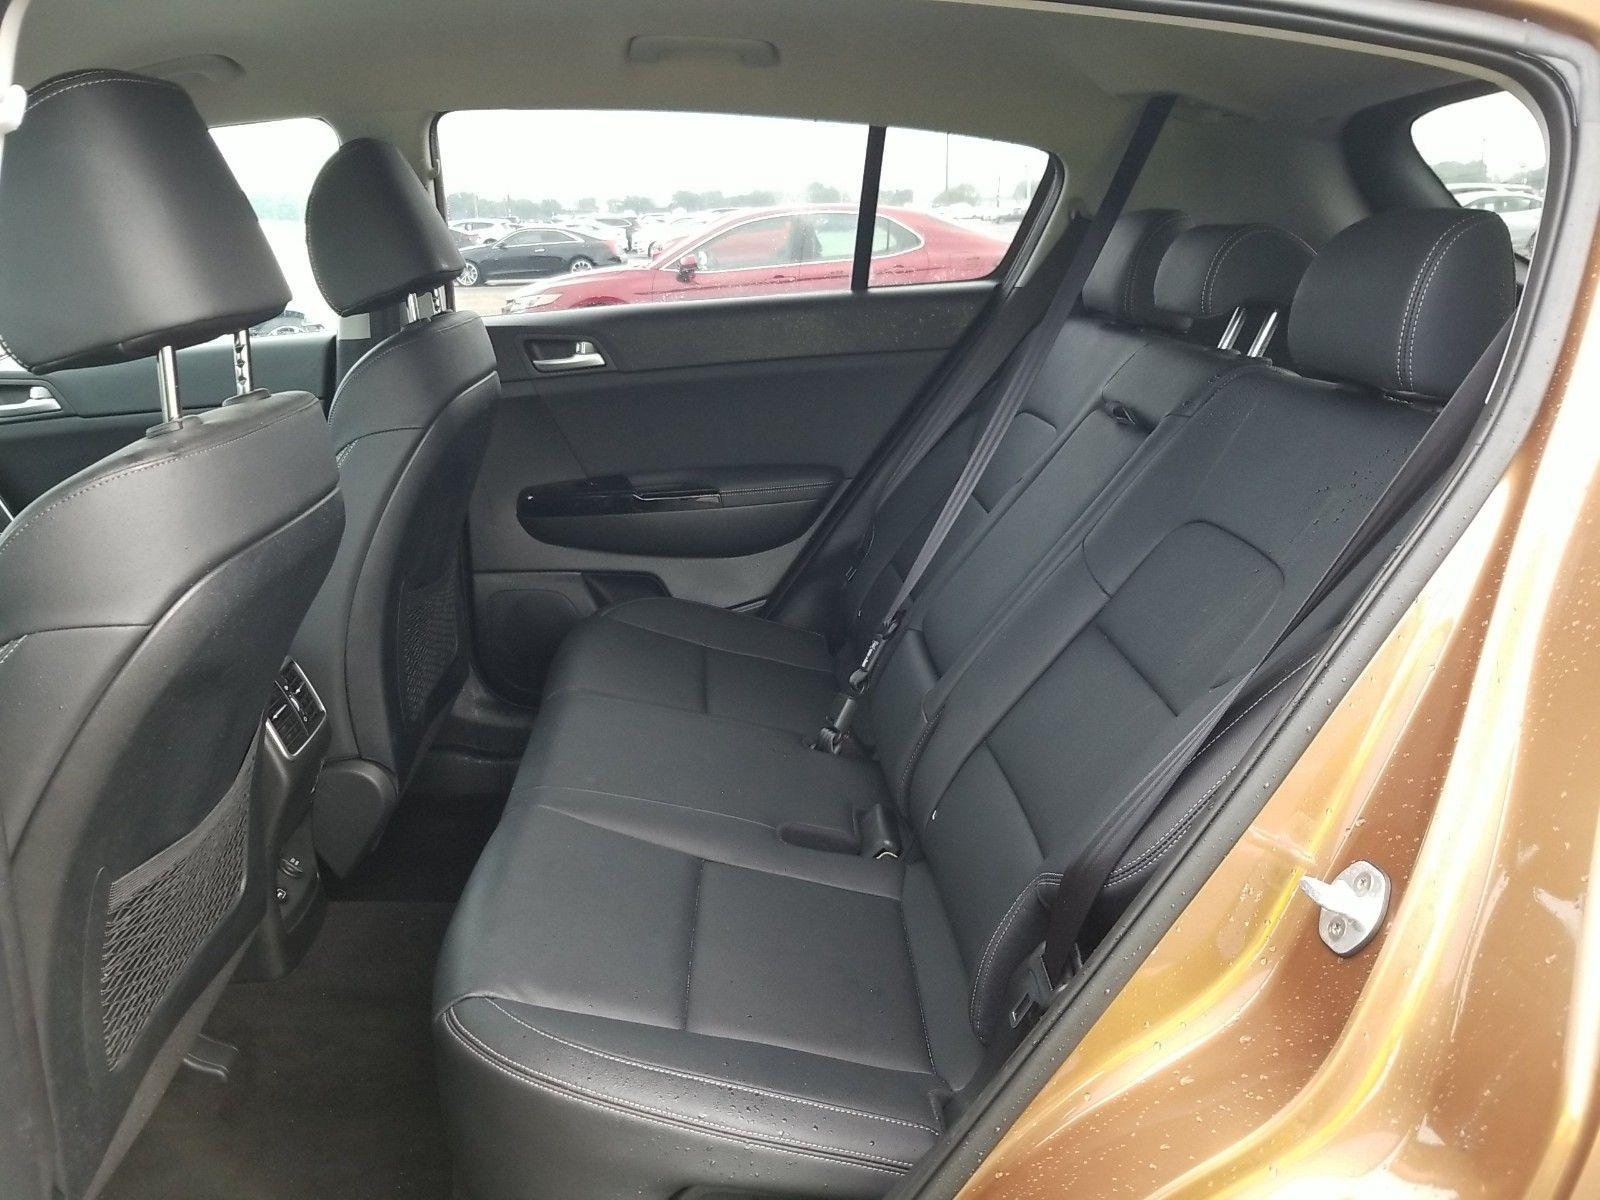 2019 KIA SPORTAGE FWD 4C EX - 13